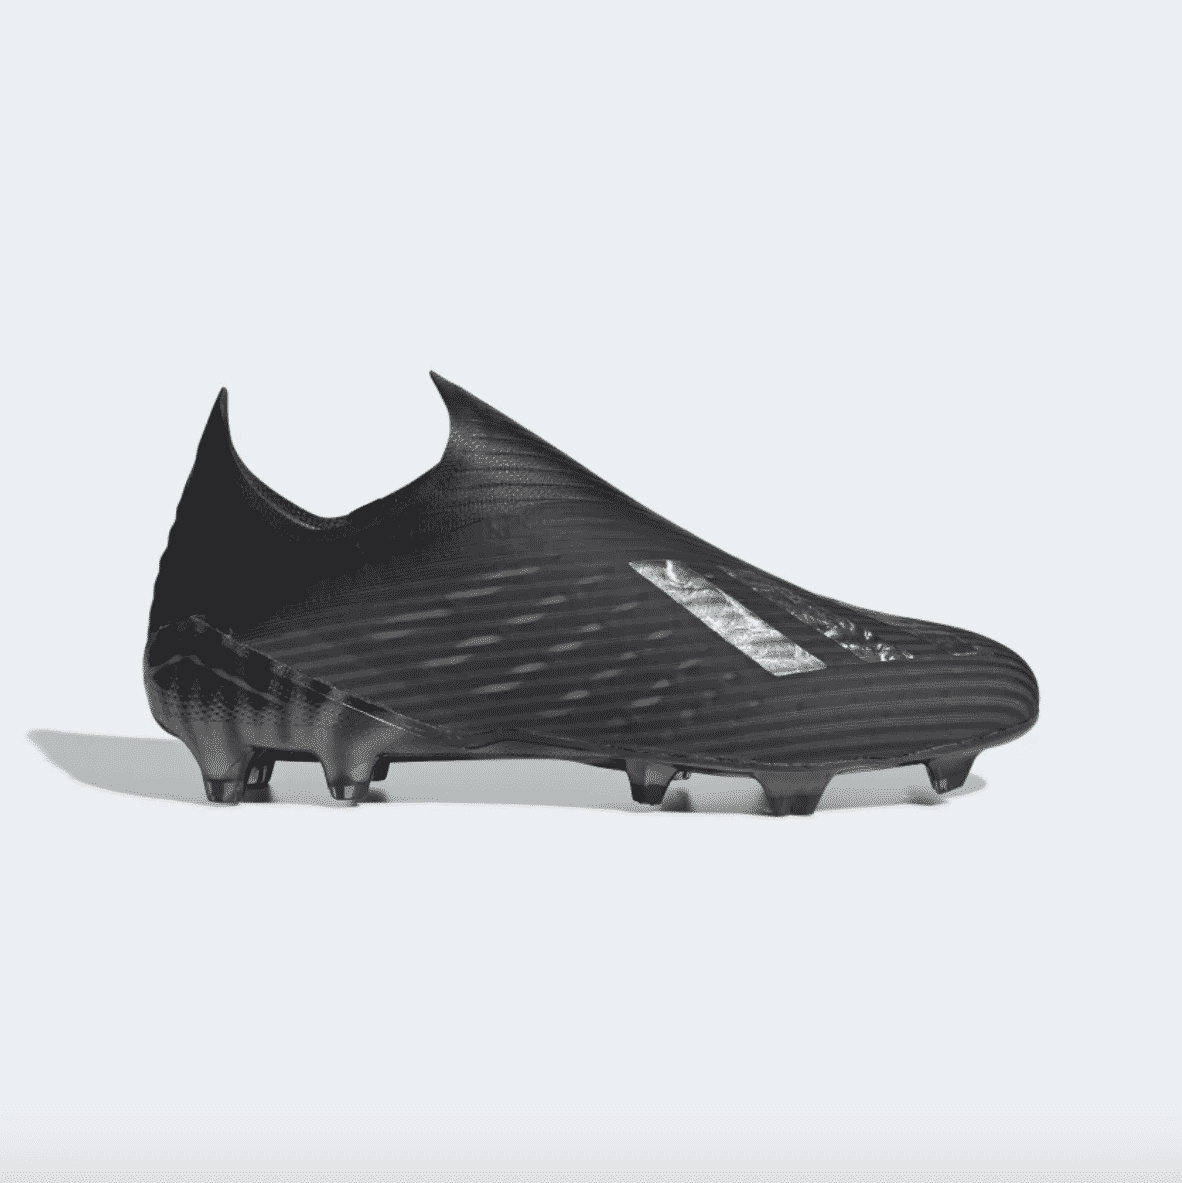 adidas-x-shadowbeast-janvier-2020-1